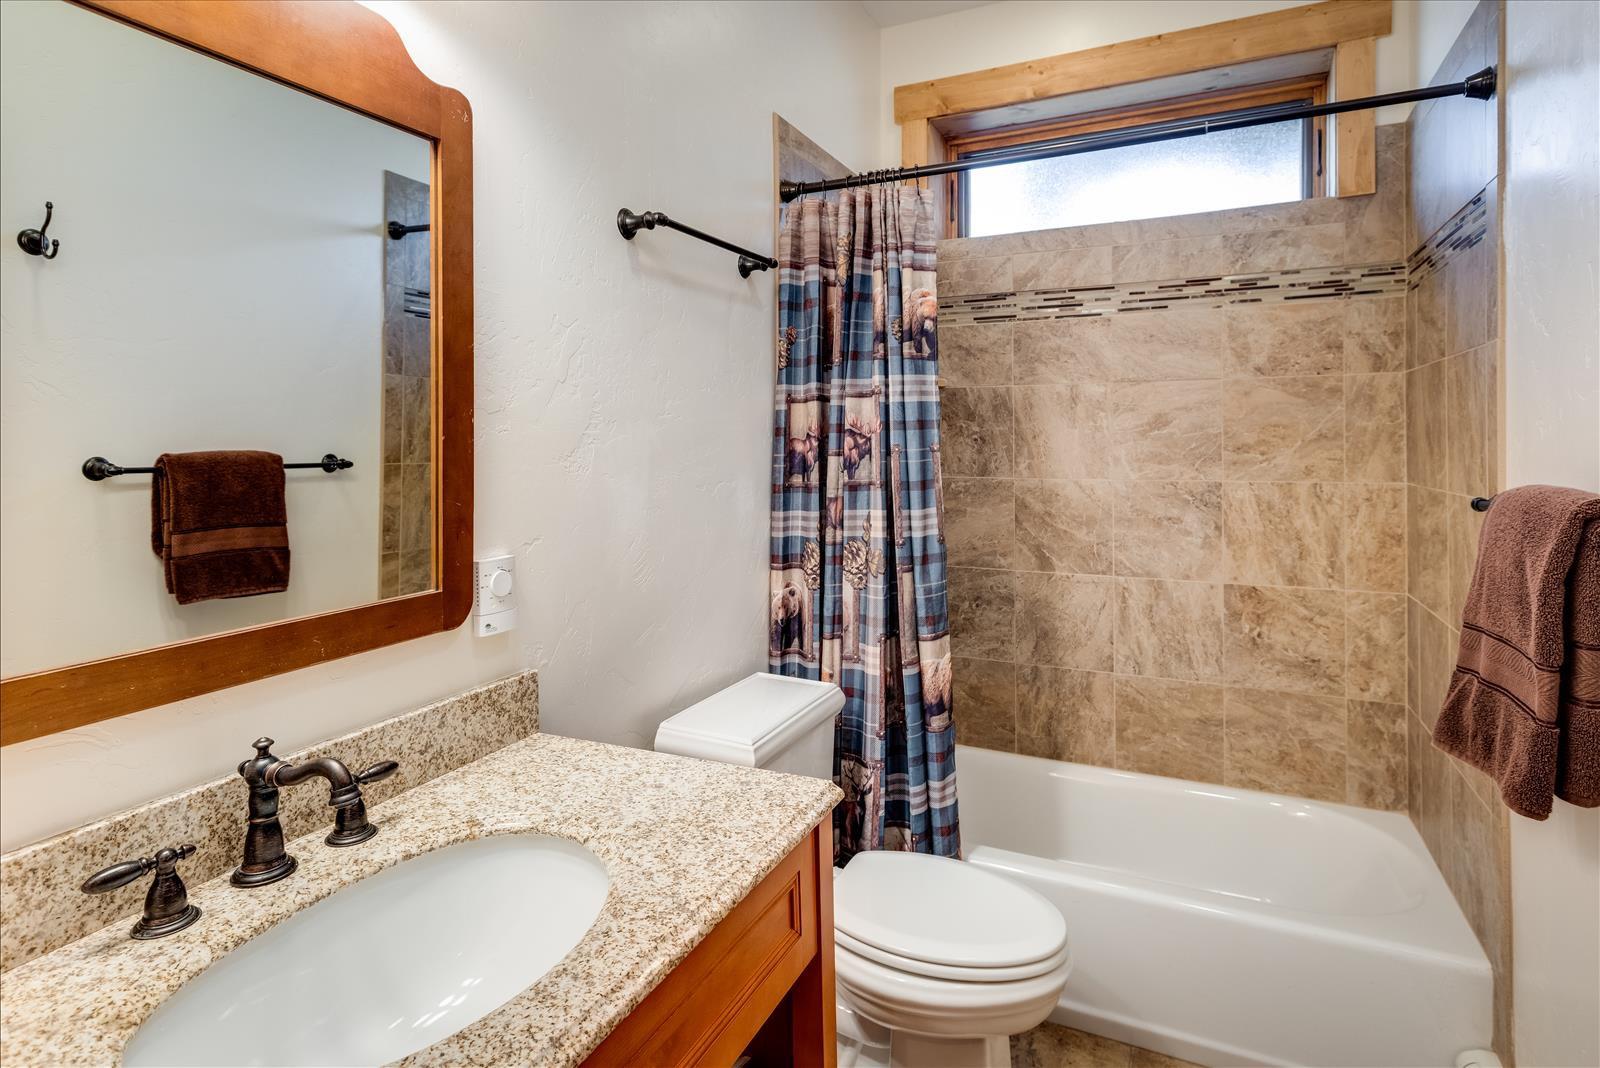 Guest bathroom downstairs